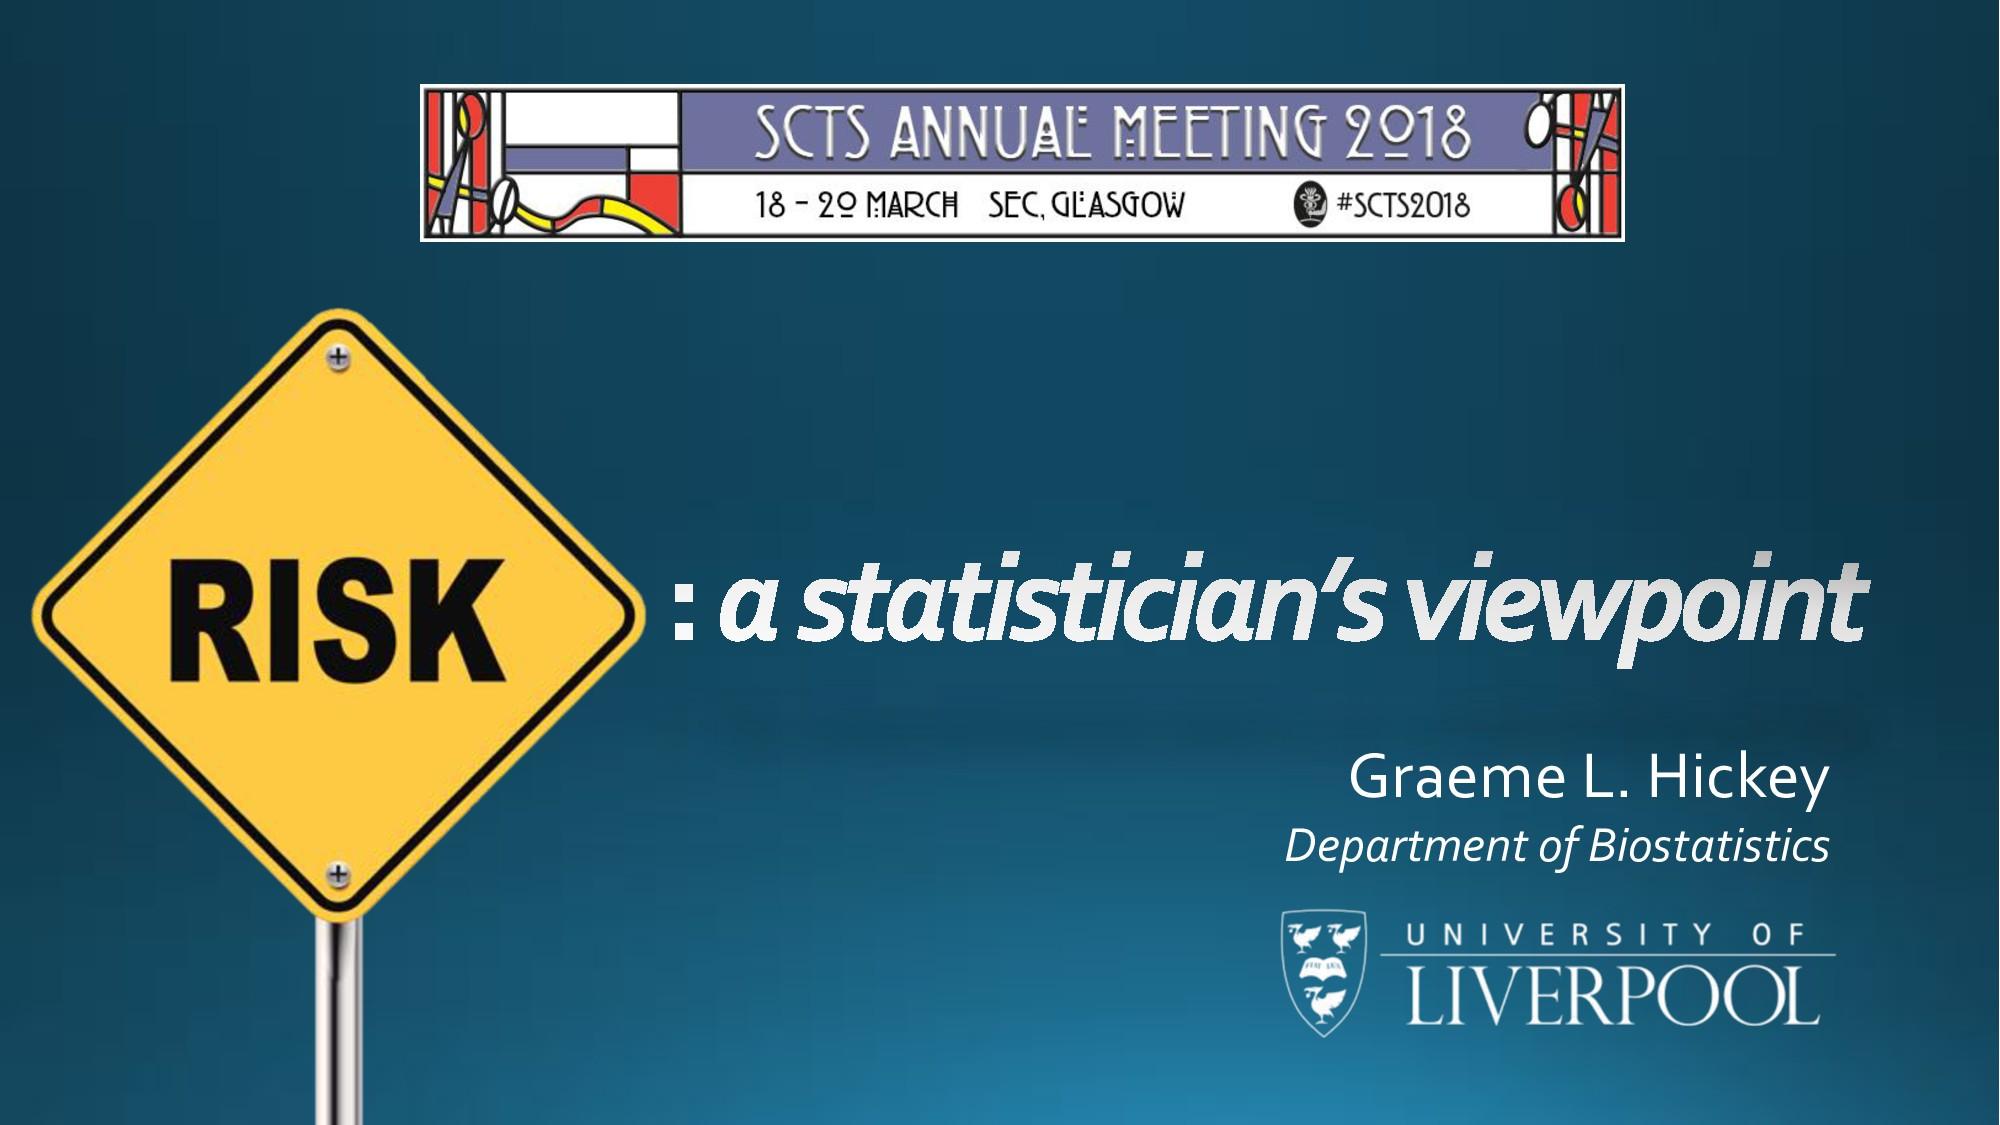 Graeme L. Hickey Department of Biostatistics